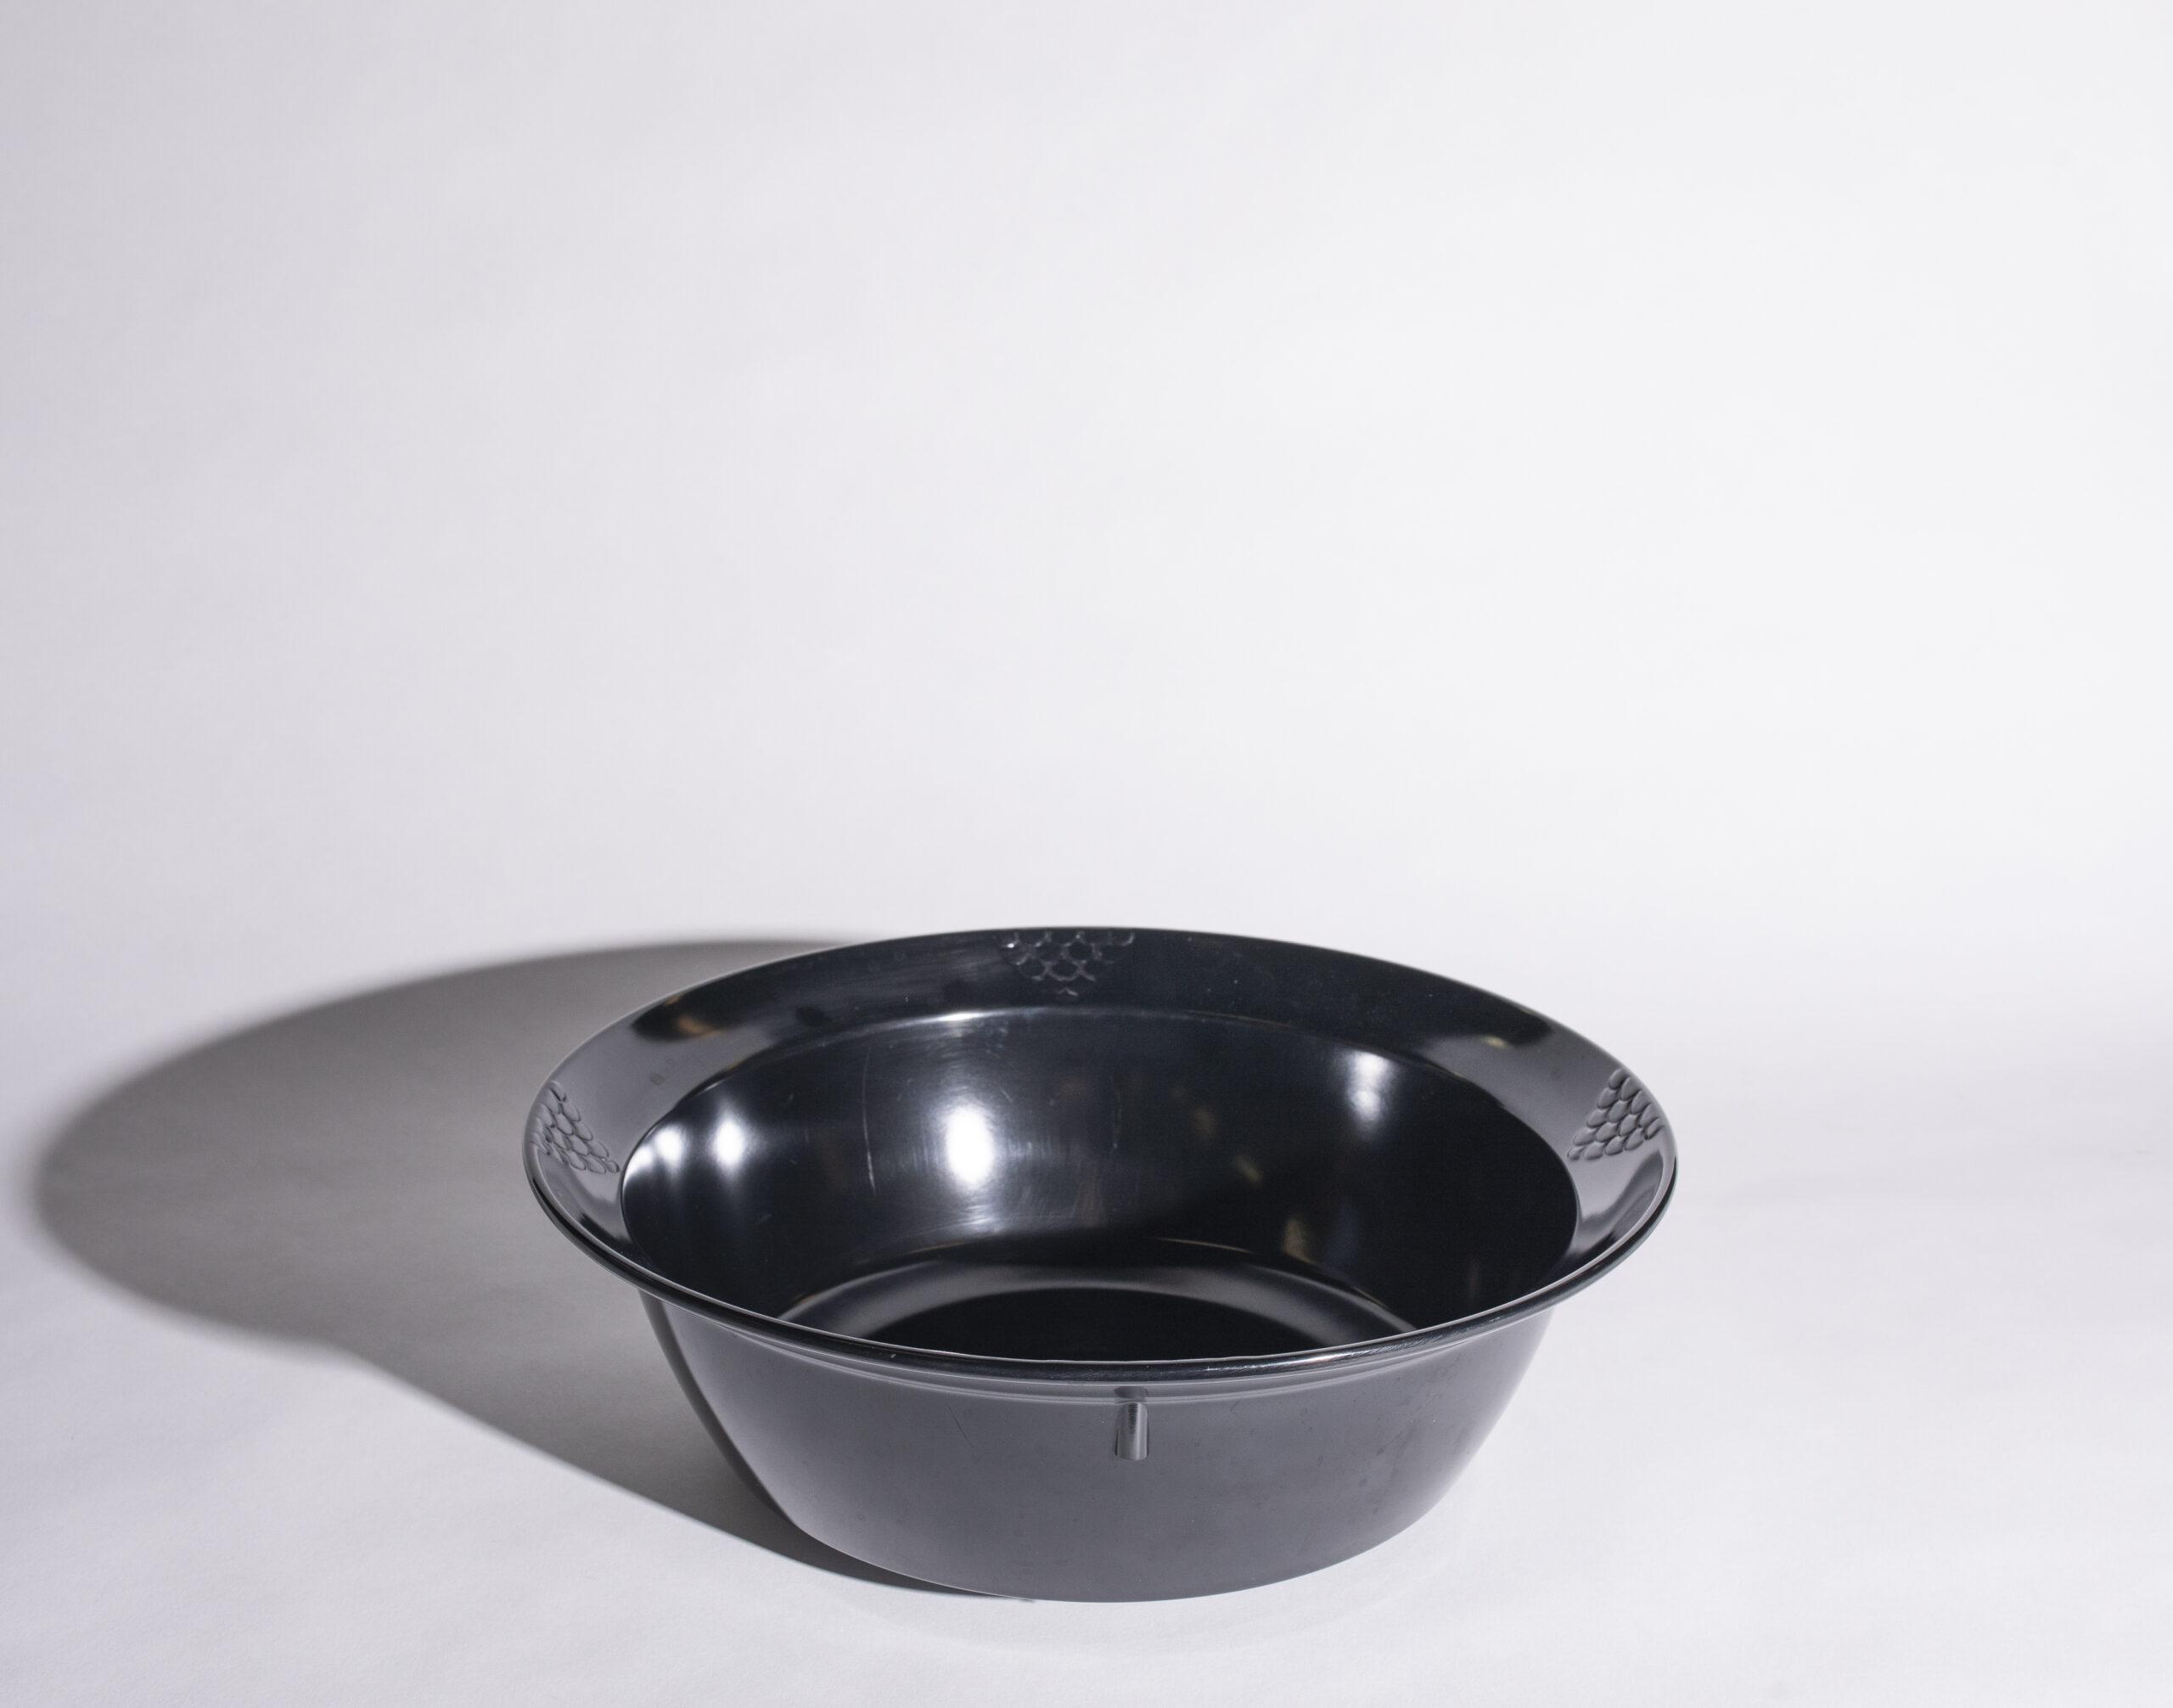 Salad bowl (15'', round, black, plastic)